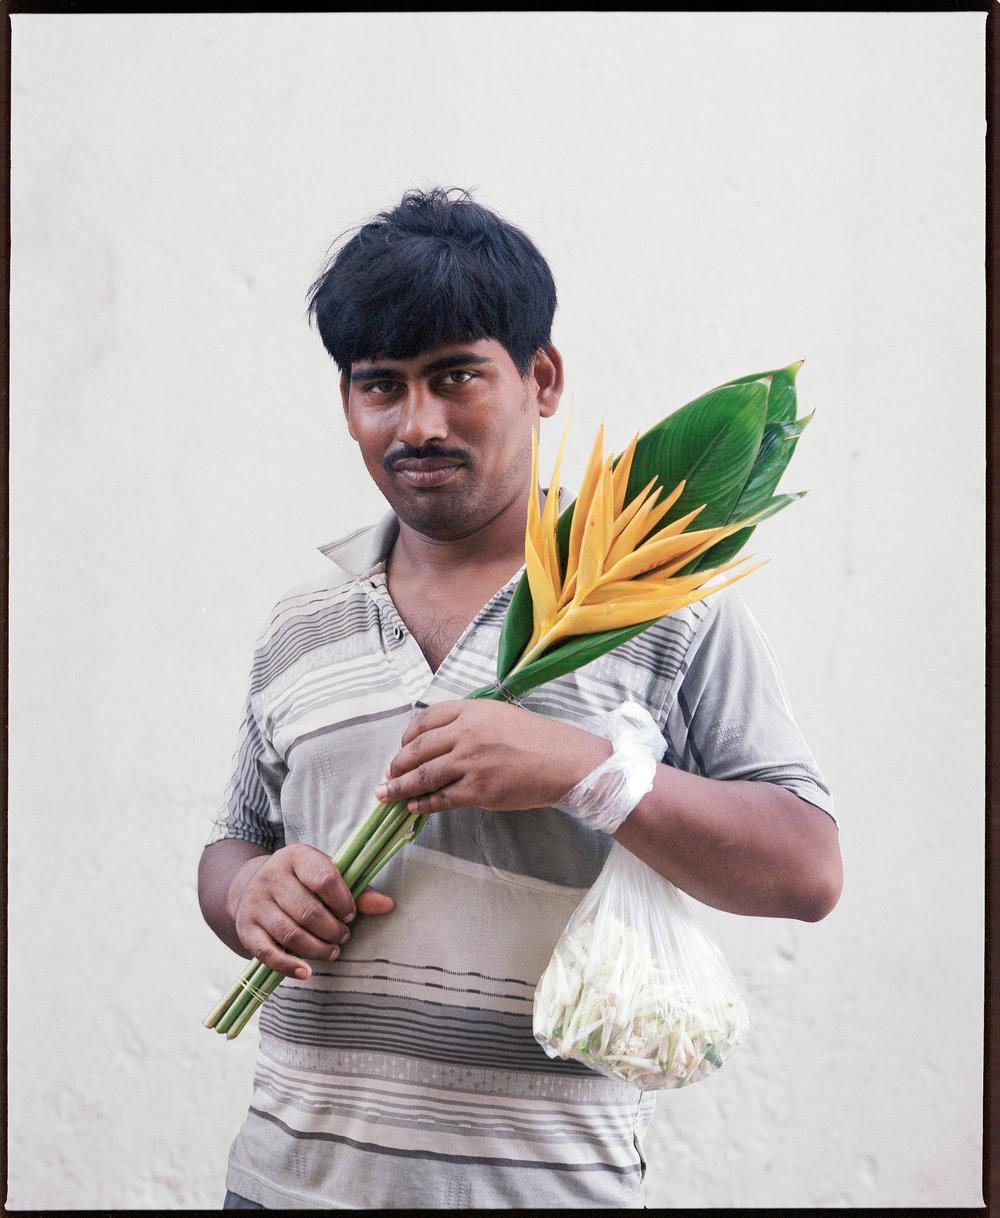 Kolkata_Flowers-5.jpg